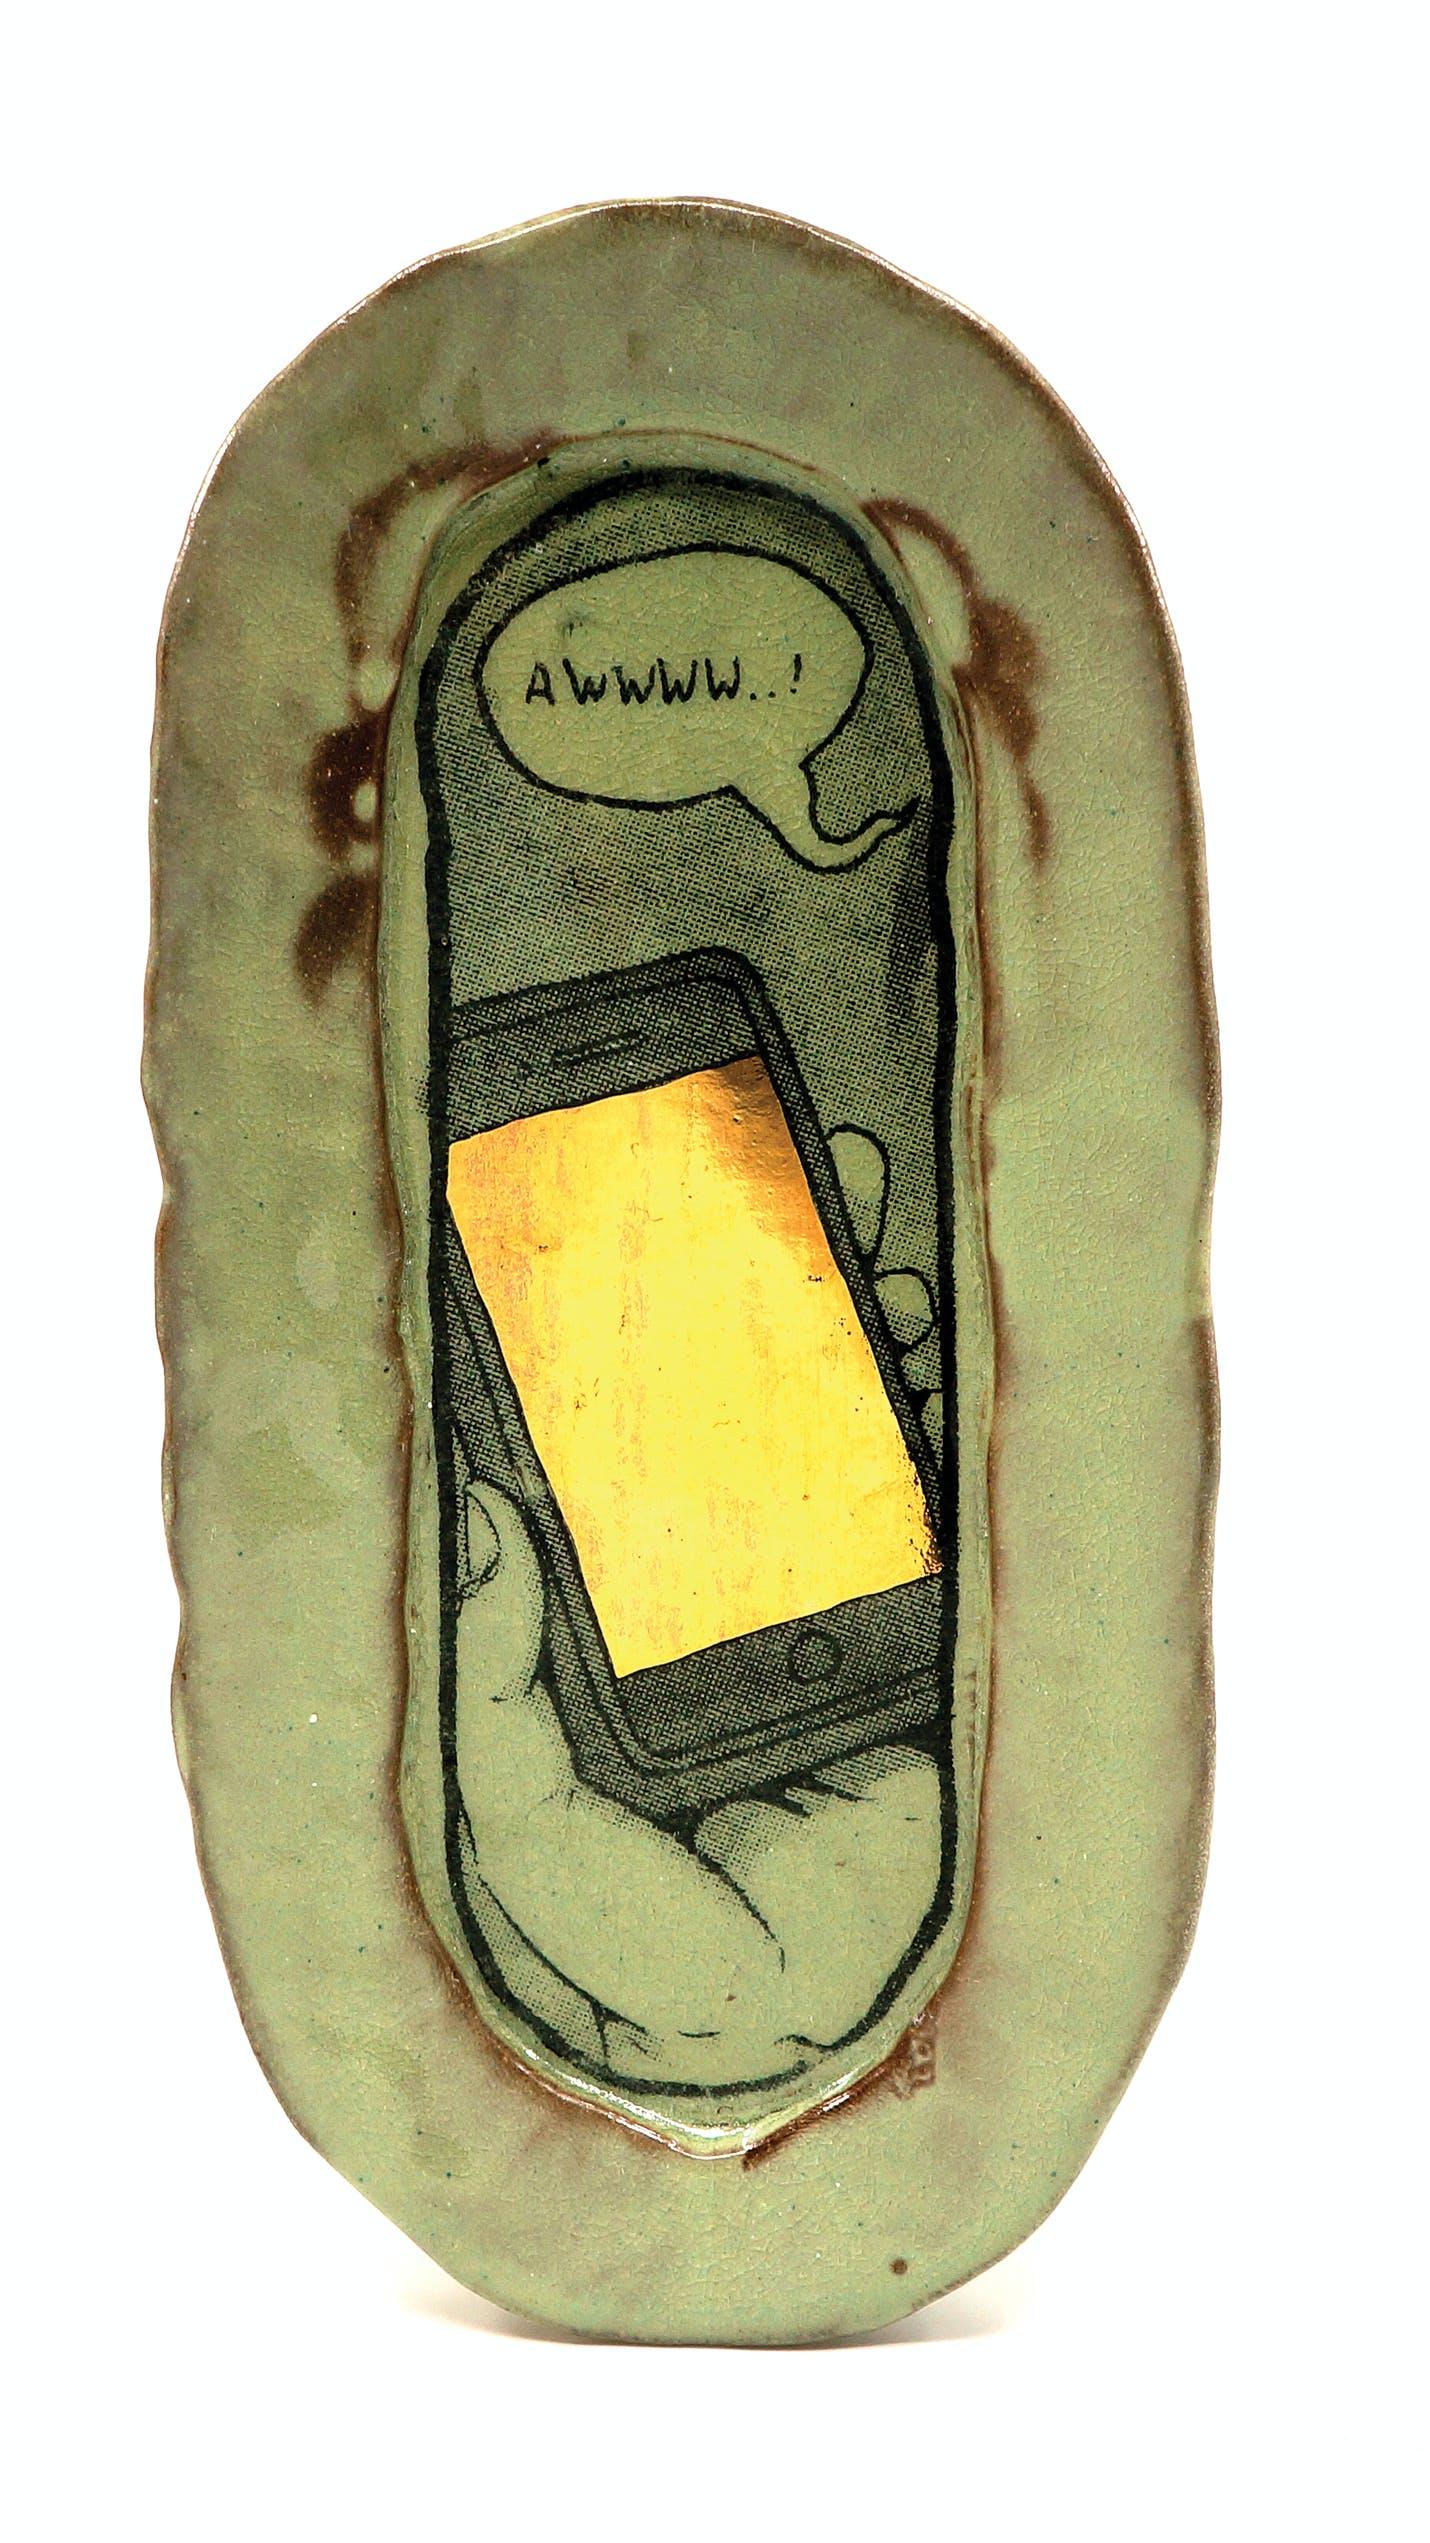 Ian Petrie Luster Cell Phone Hotdog Plate